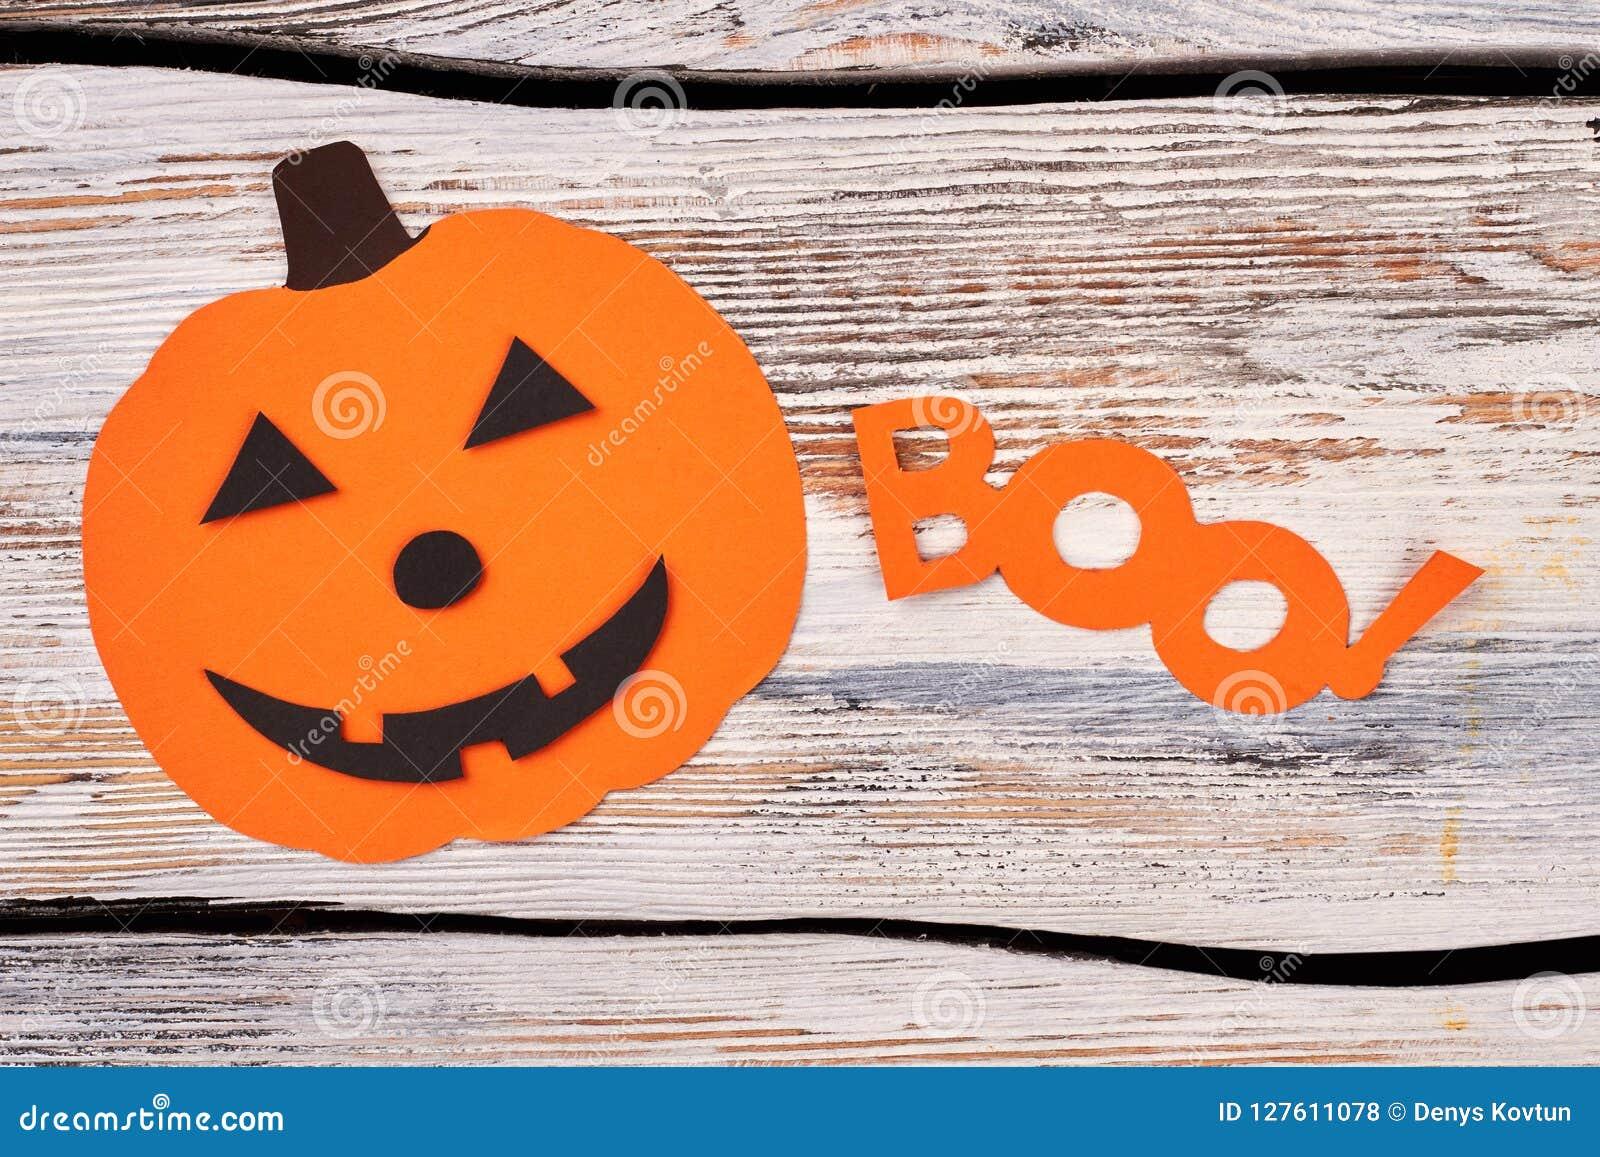 Halloween Pumpkin Paper Silhouette Stock Photo Image Of Design